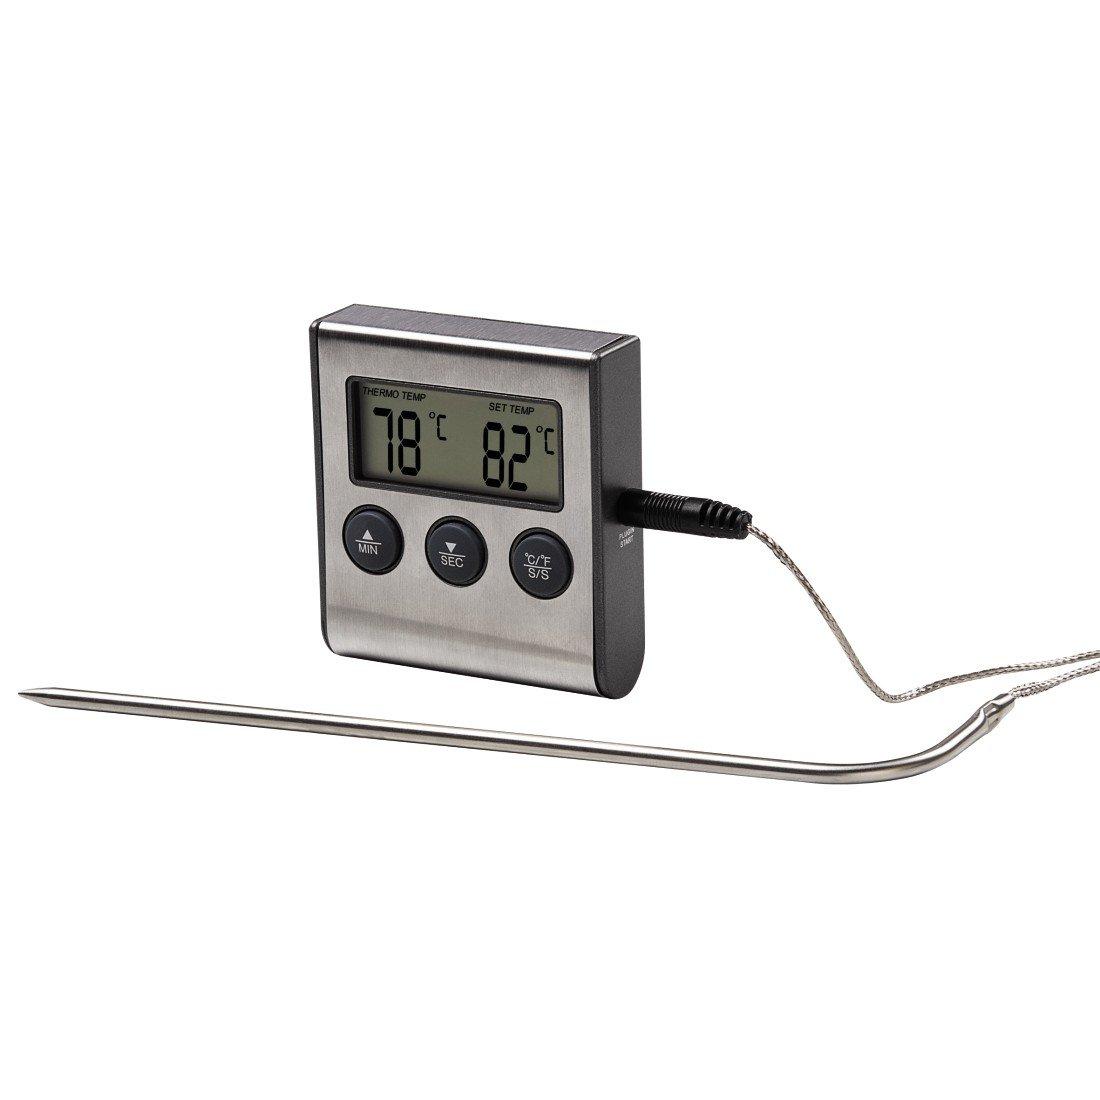 Xavax 2-in-1 digitale braadthermometer (met keukenklok, afneembare temperatuursensor, grillthermometer oventhermometer vleesthermometer)